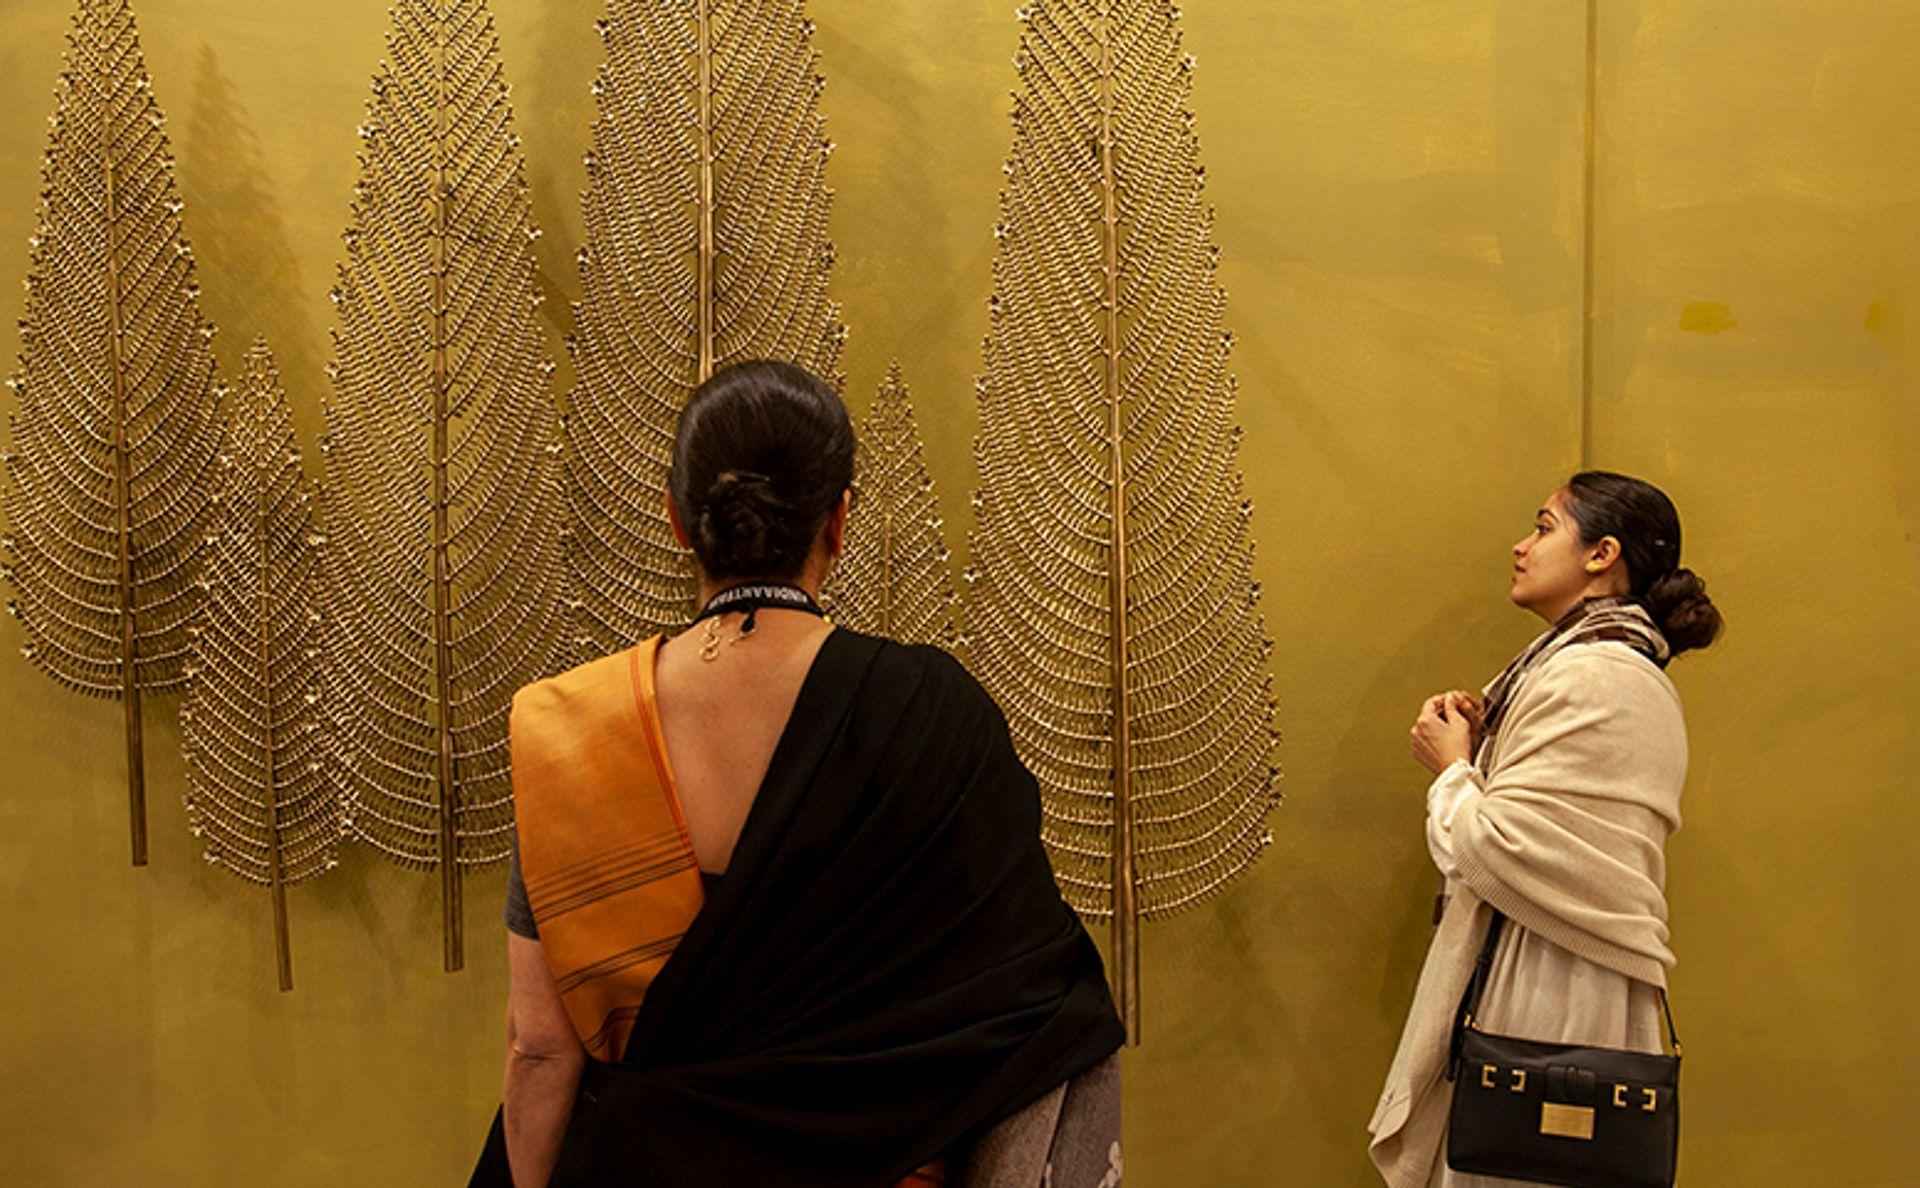 Chinar by Delhi Crafts Council, shown at India Art Fair 2020 in New Delhi Courtesy of India Art Fair. Photo: Jeetin Sharma